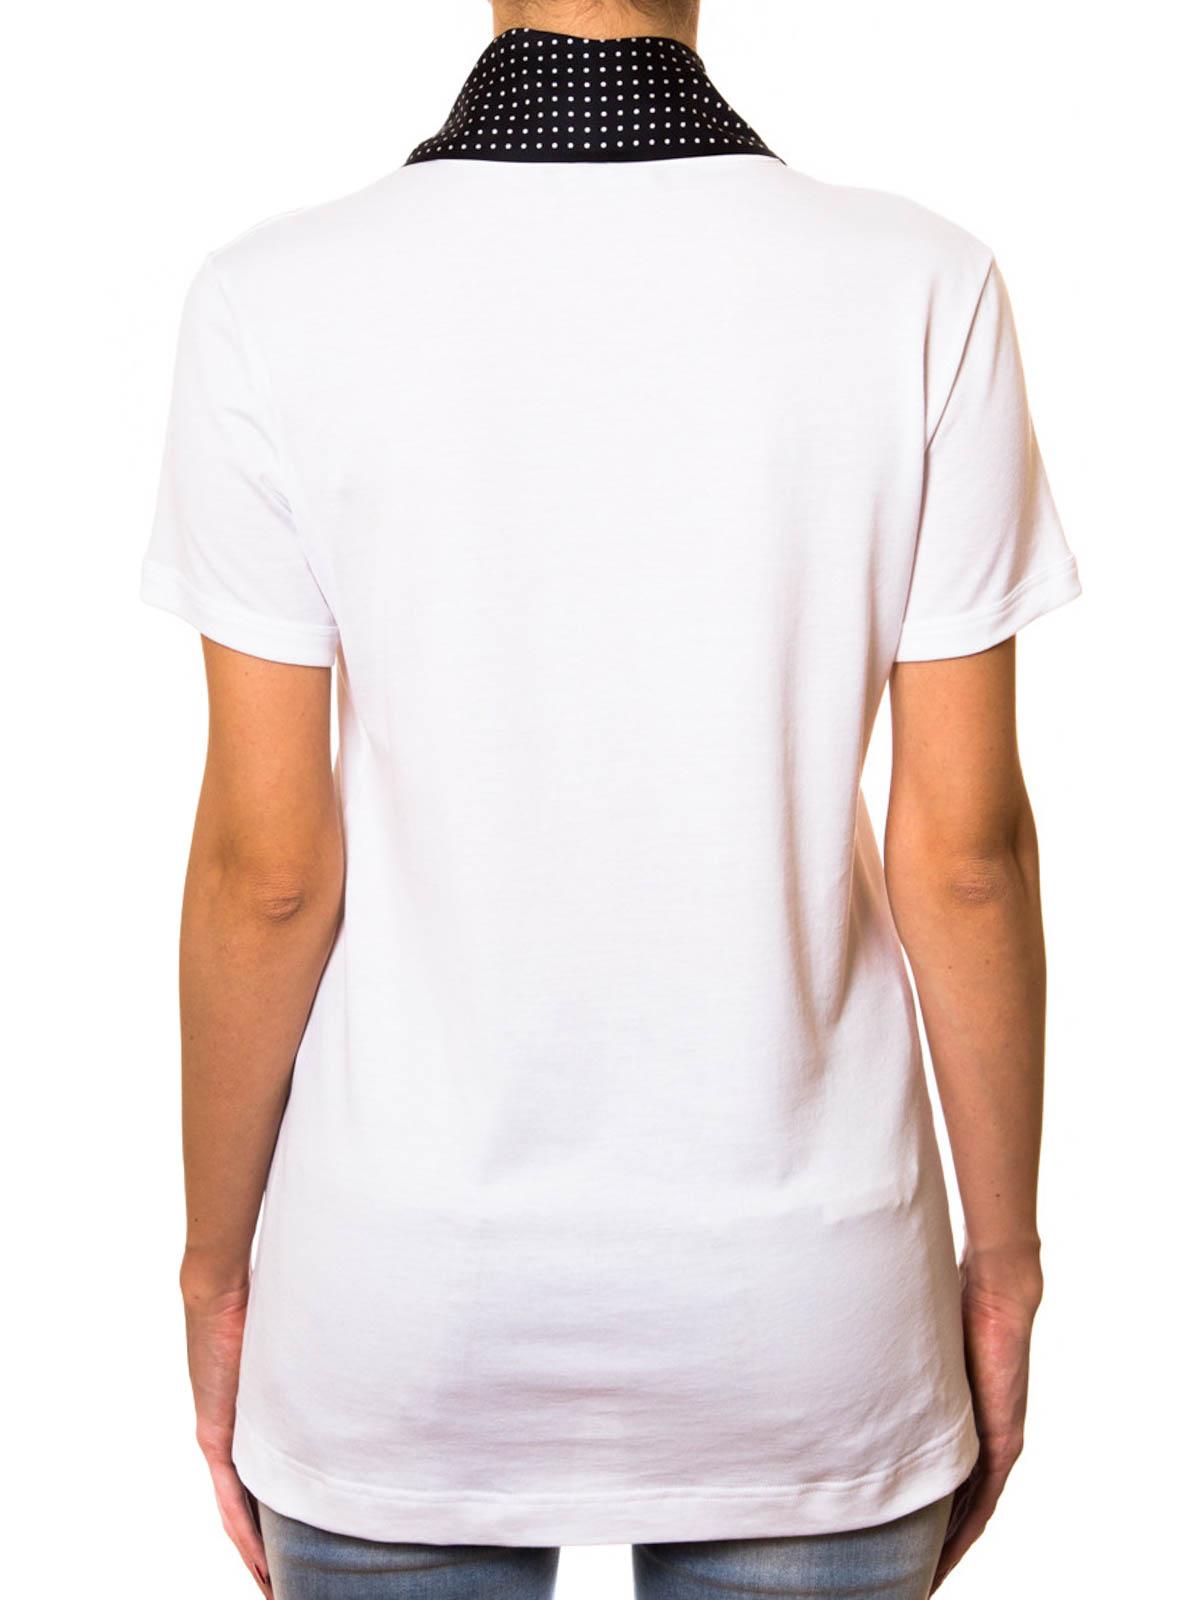 dolce gabbana scarf detailed t shirt t shirts f8h08tfu7eqs9008. Black Bedroom Furniture Sets. Home Design Ideas